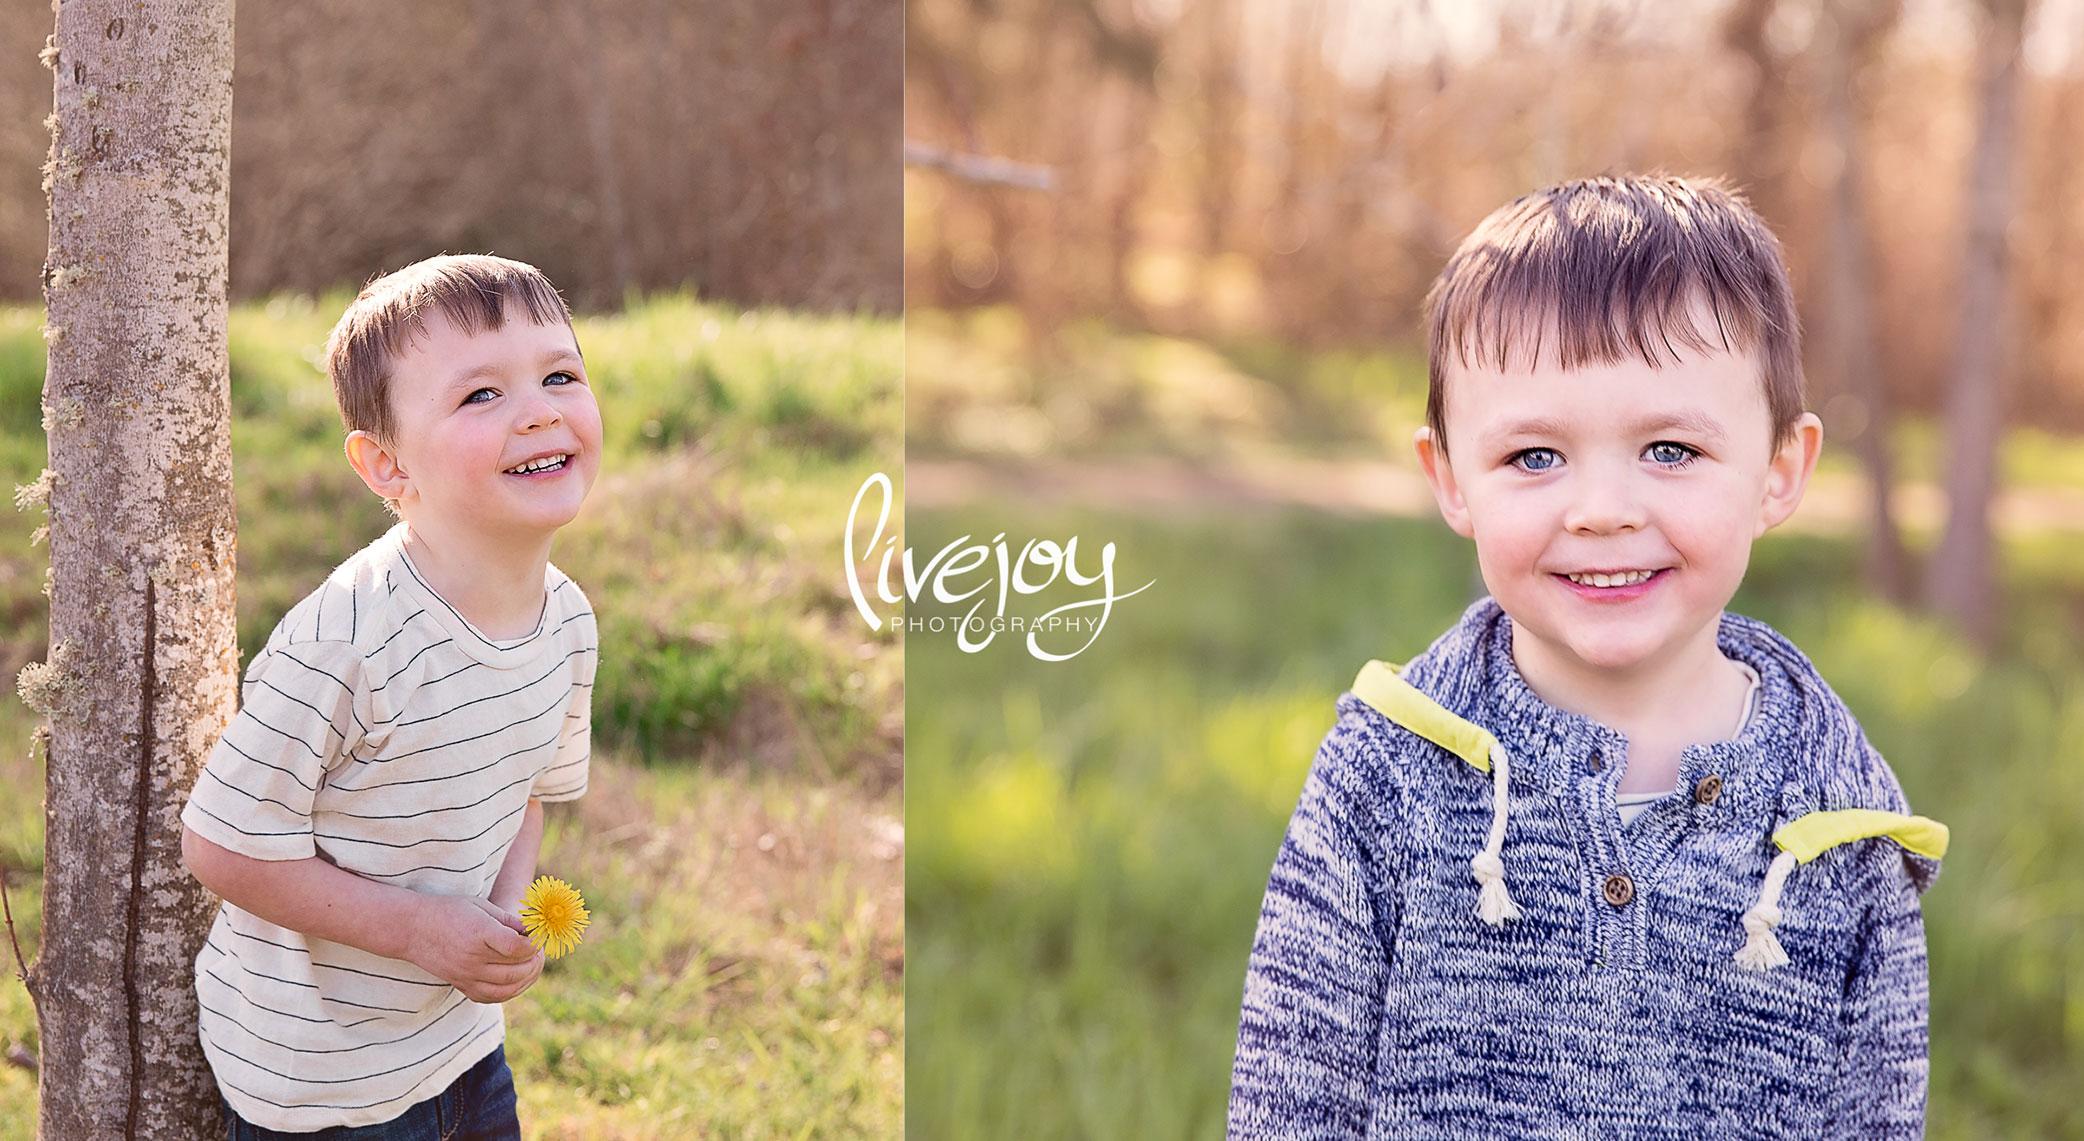 3 Year old Toddler Photos | Oregon | LiveJoy Photography